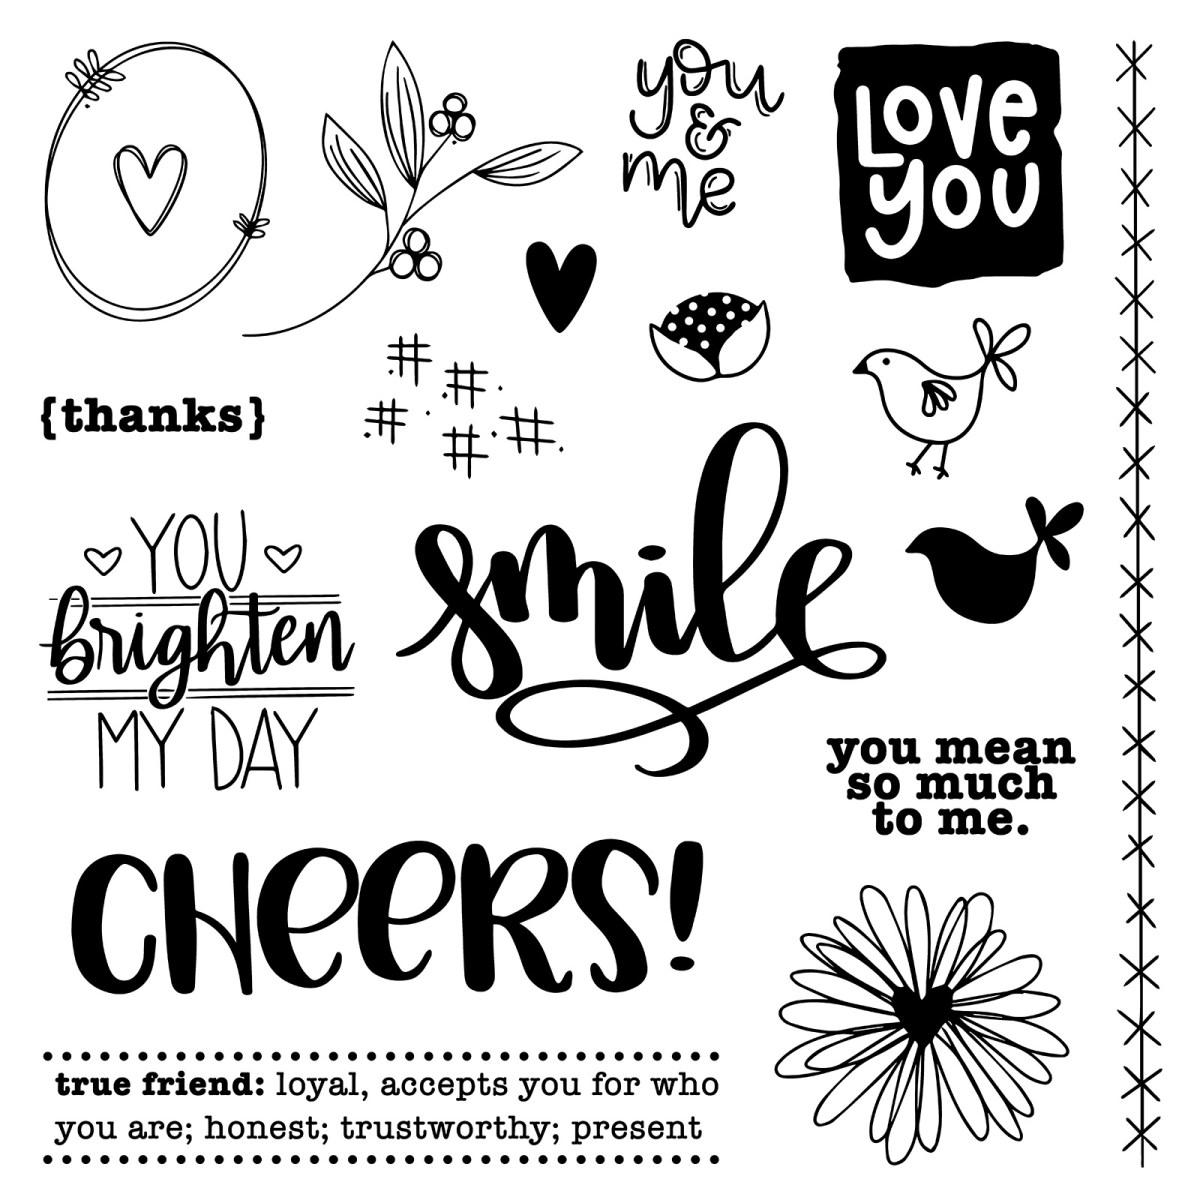 Stamping Techniques #ctmh #closetomyheart #nationalstampingmonth #nsm #stampingtechniques #youbrightenmyday